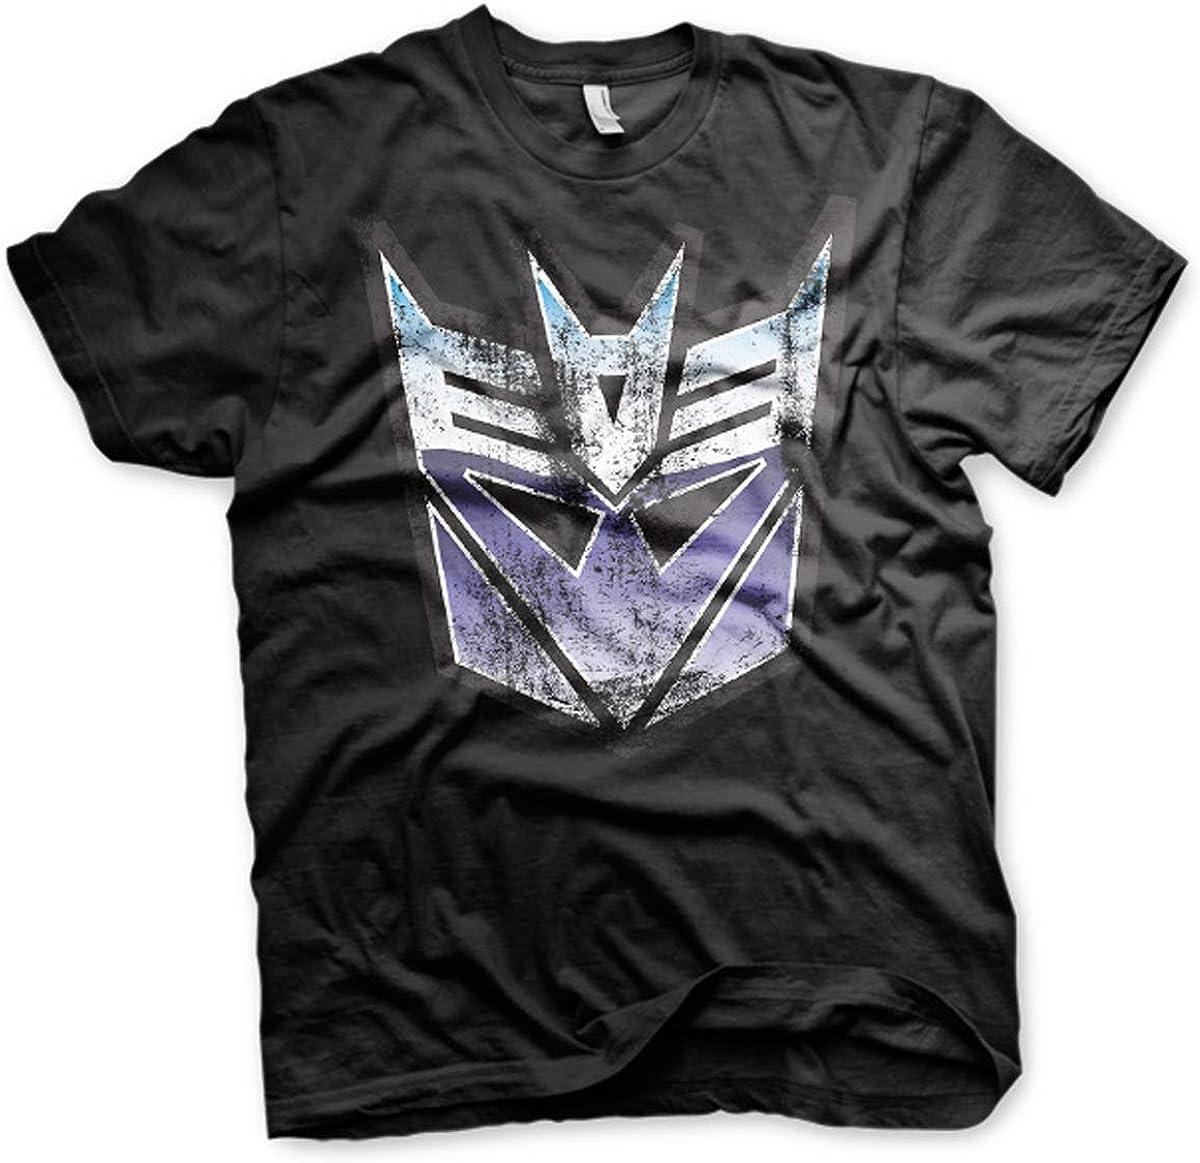 Transformers Megatron Decepticon Logo Official Tee T-Shirt Mens